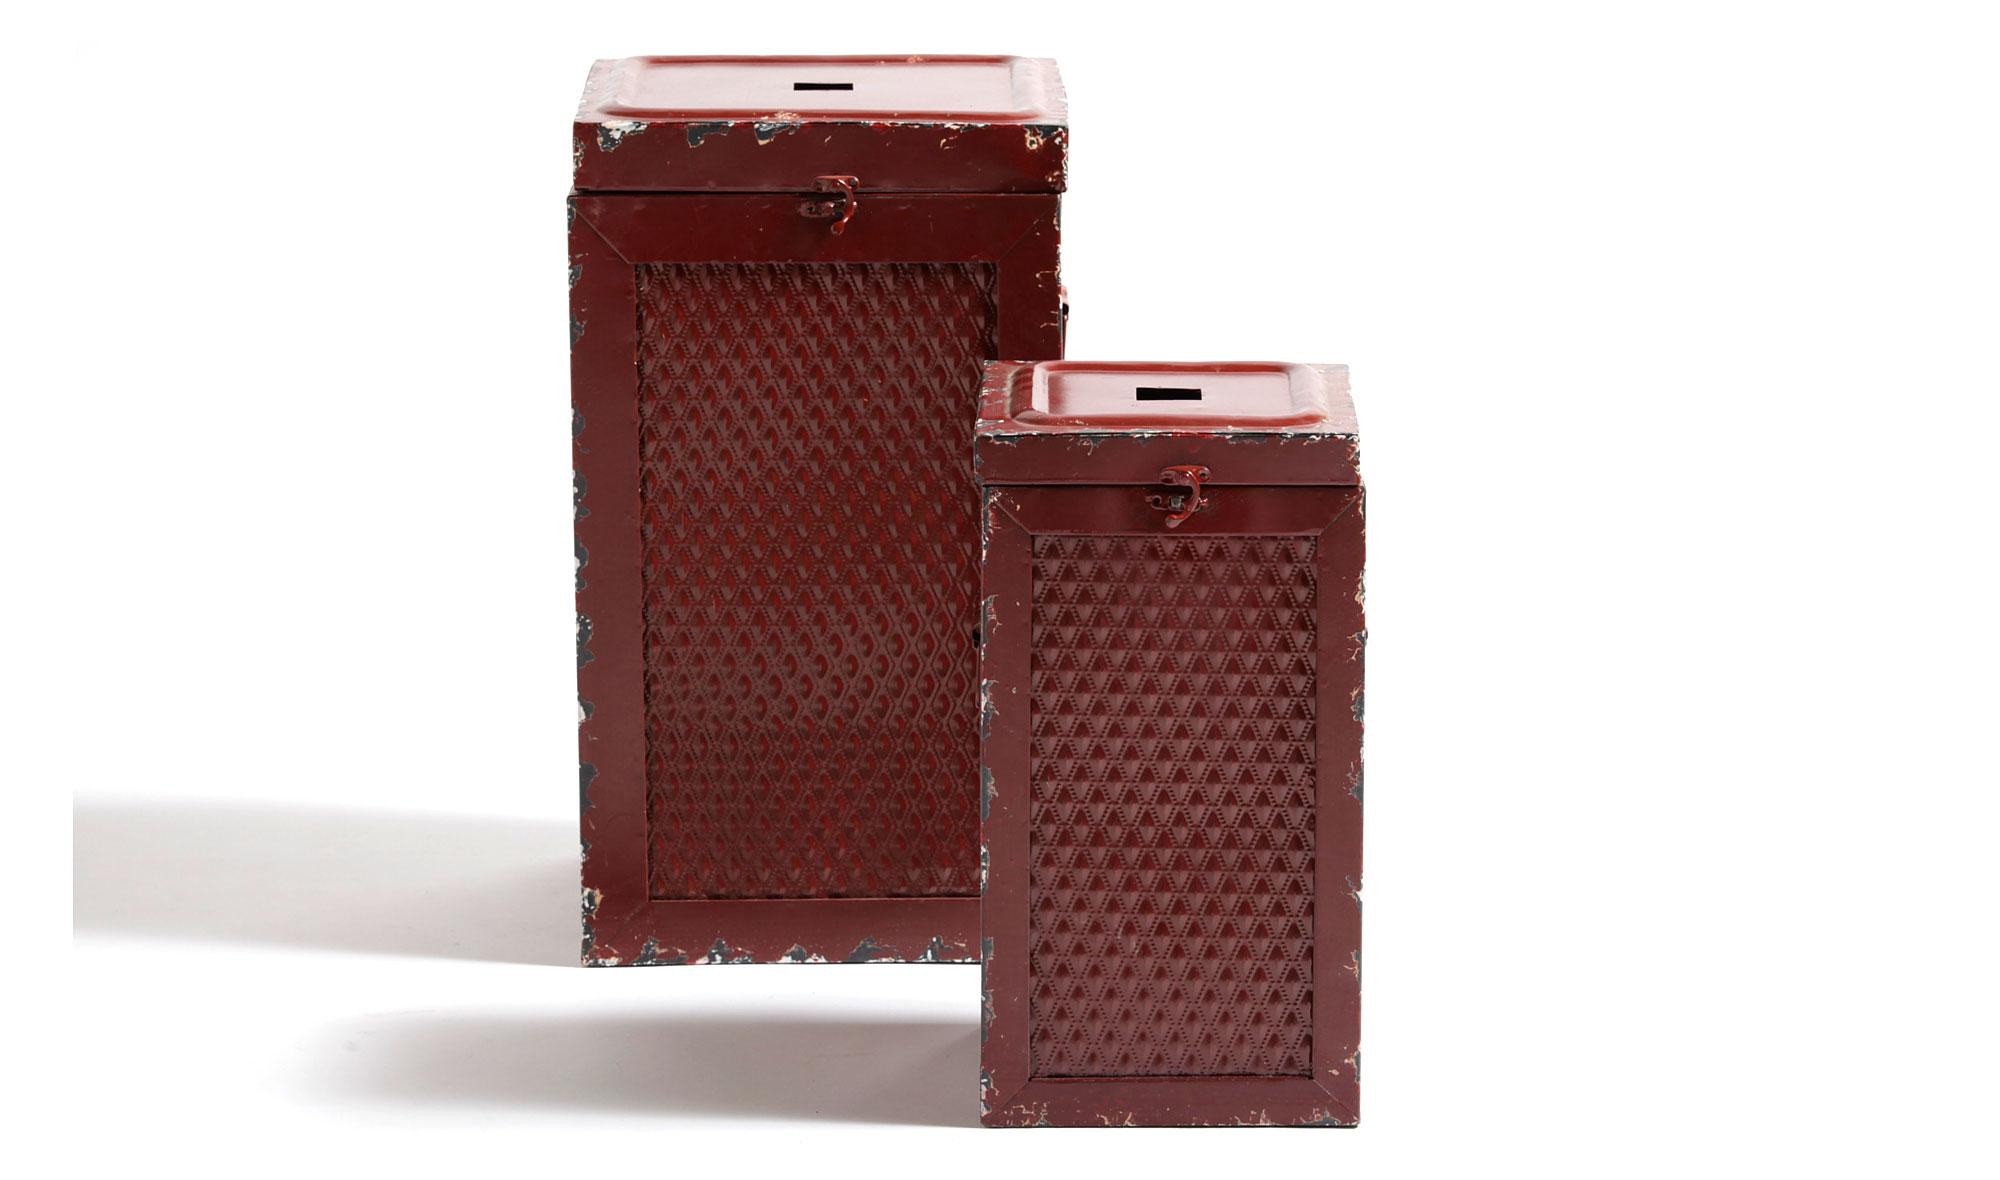 Set 2 taburetes bajos caja rojo vintage Antique